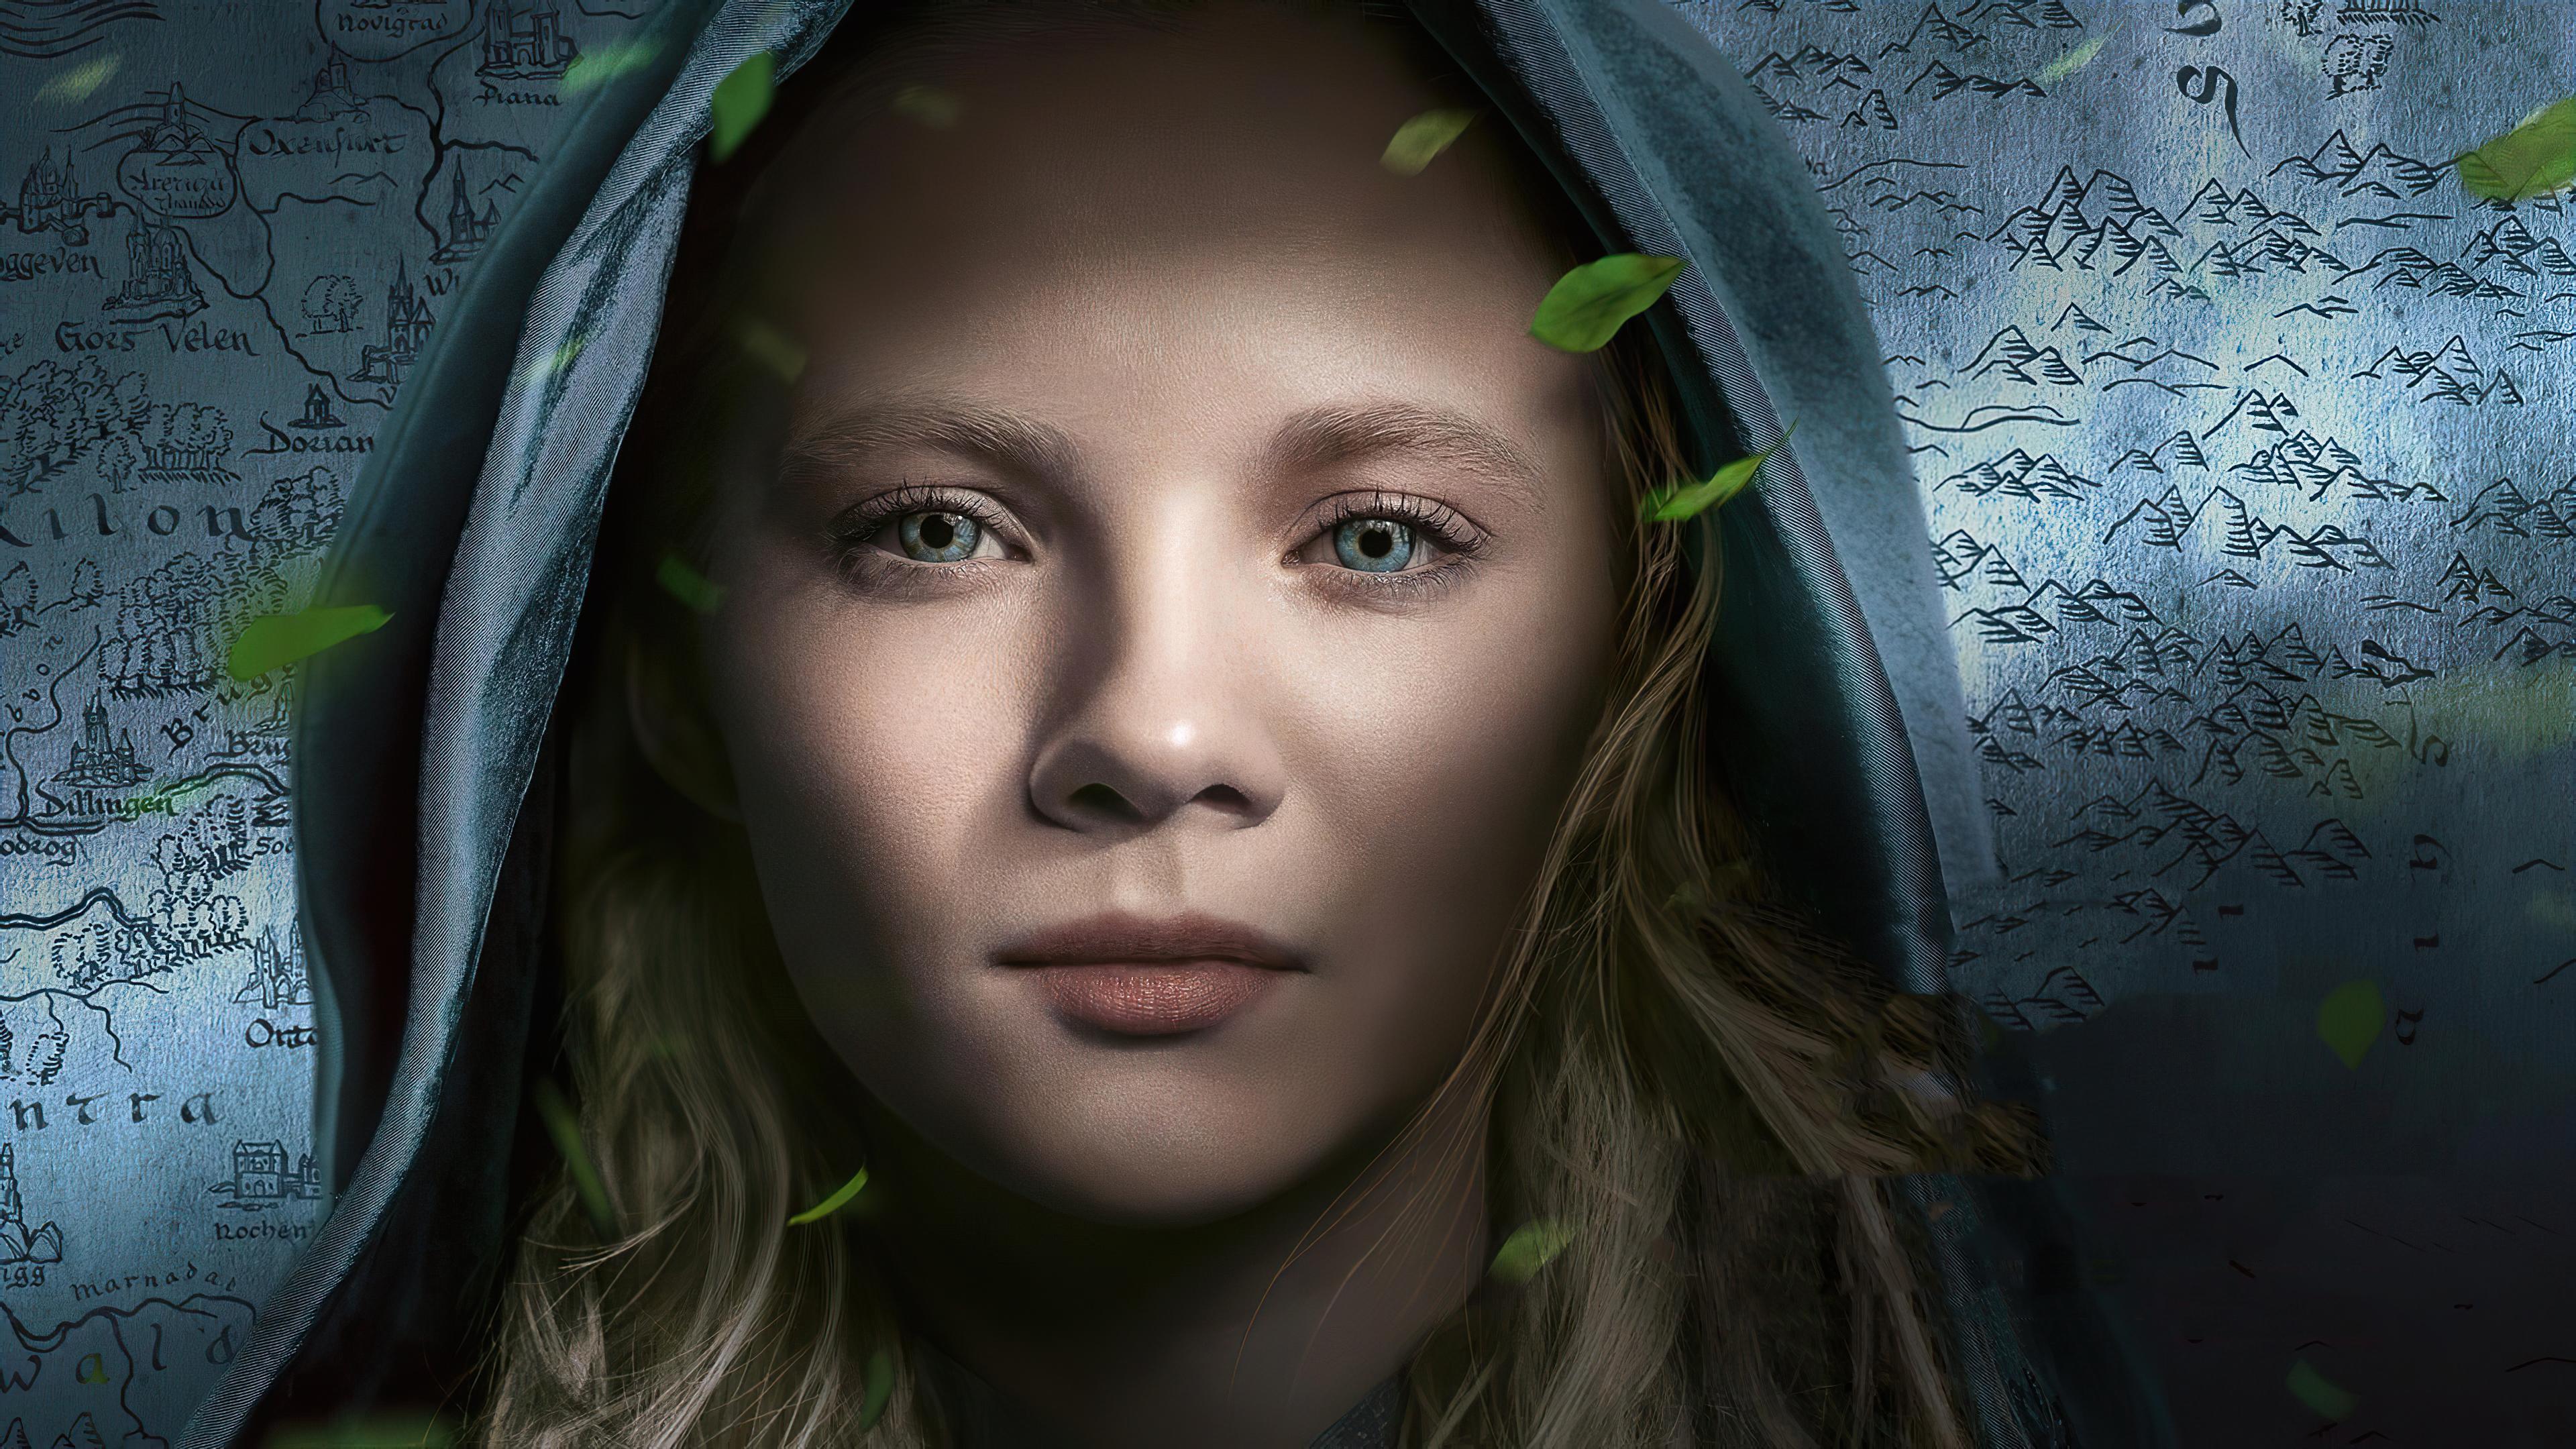 freya allan in the witcher 1578253255 - Freya Allan In The Witcher -